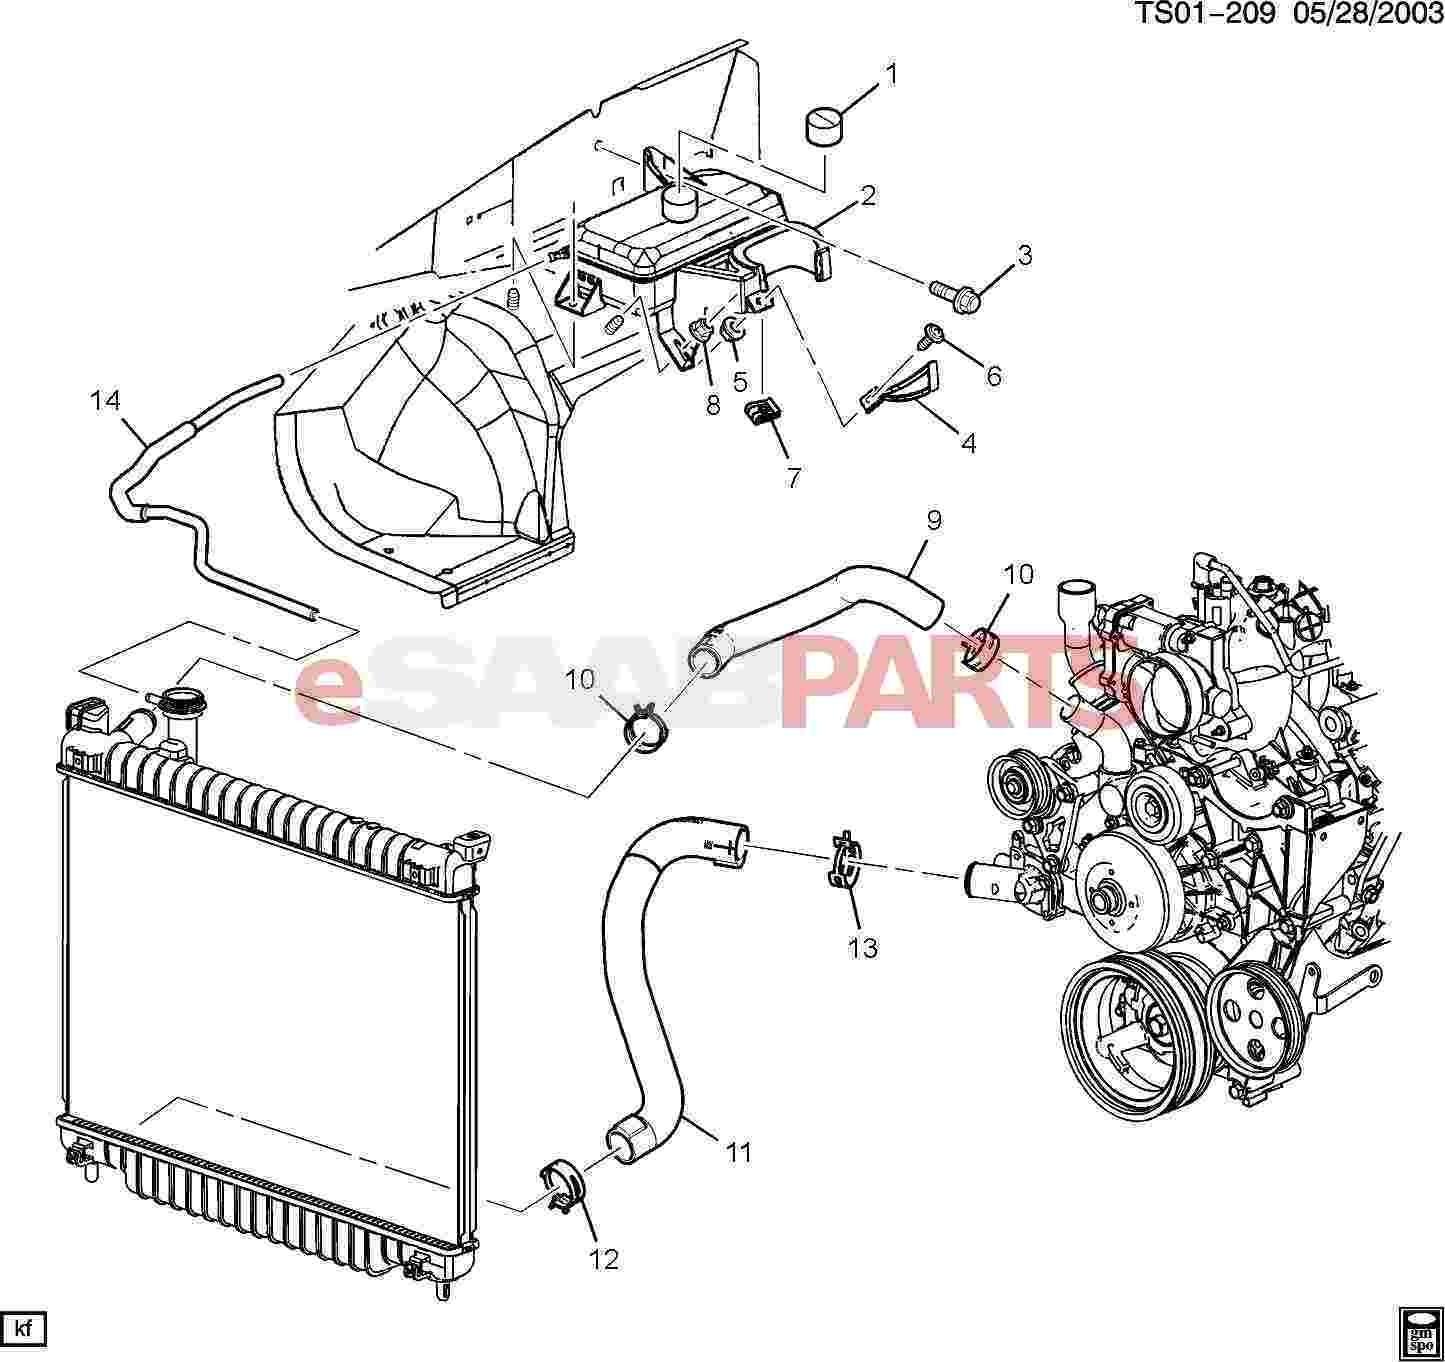 7 3 Engine Parts Diagram Esaabparts Saab 9 7x Engine Parts Heater Hoses Radiator Of 7 3 Engine Parts Diagram